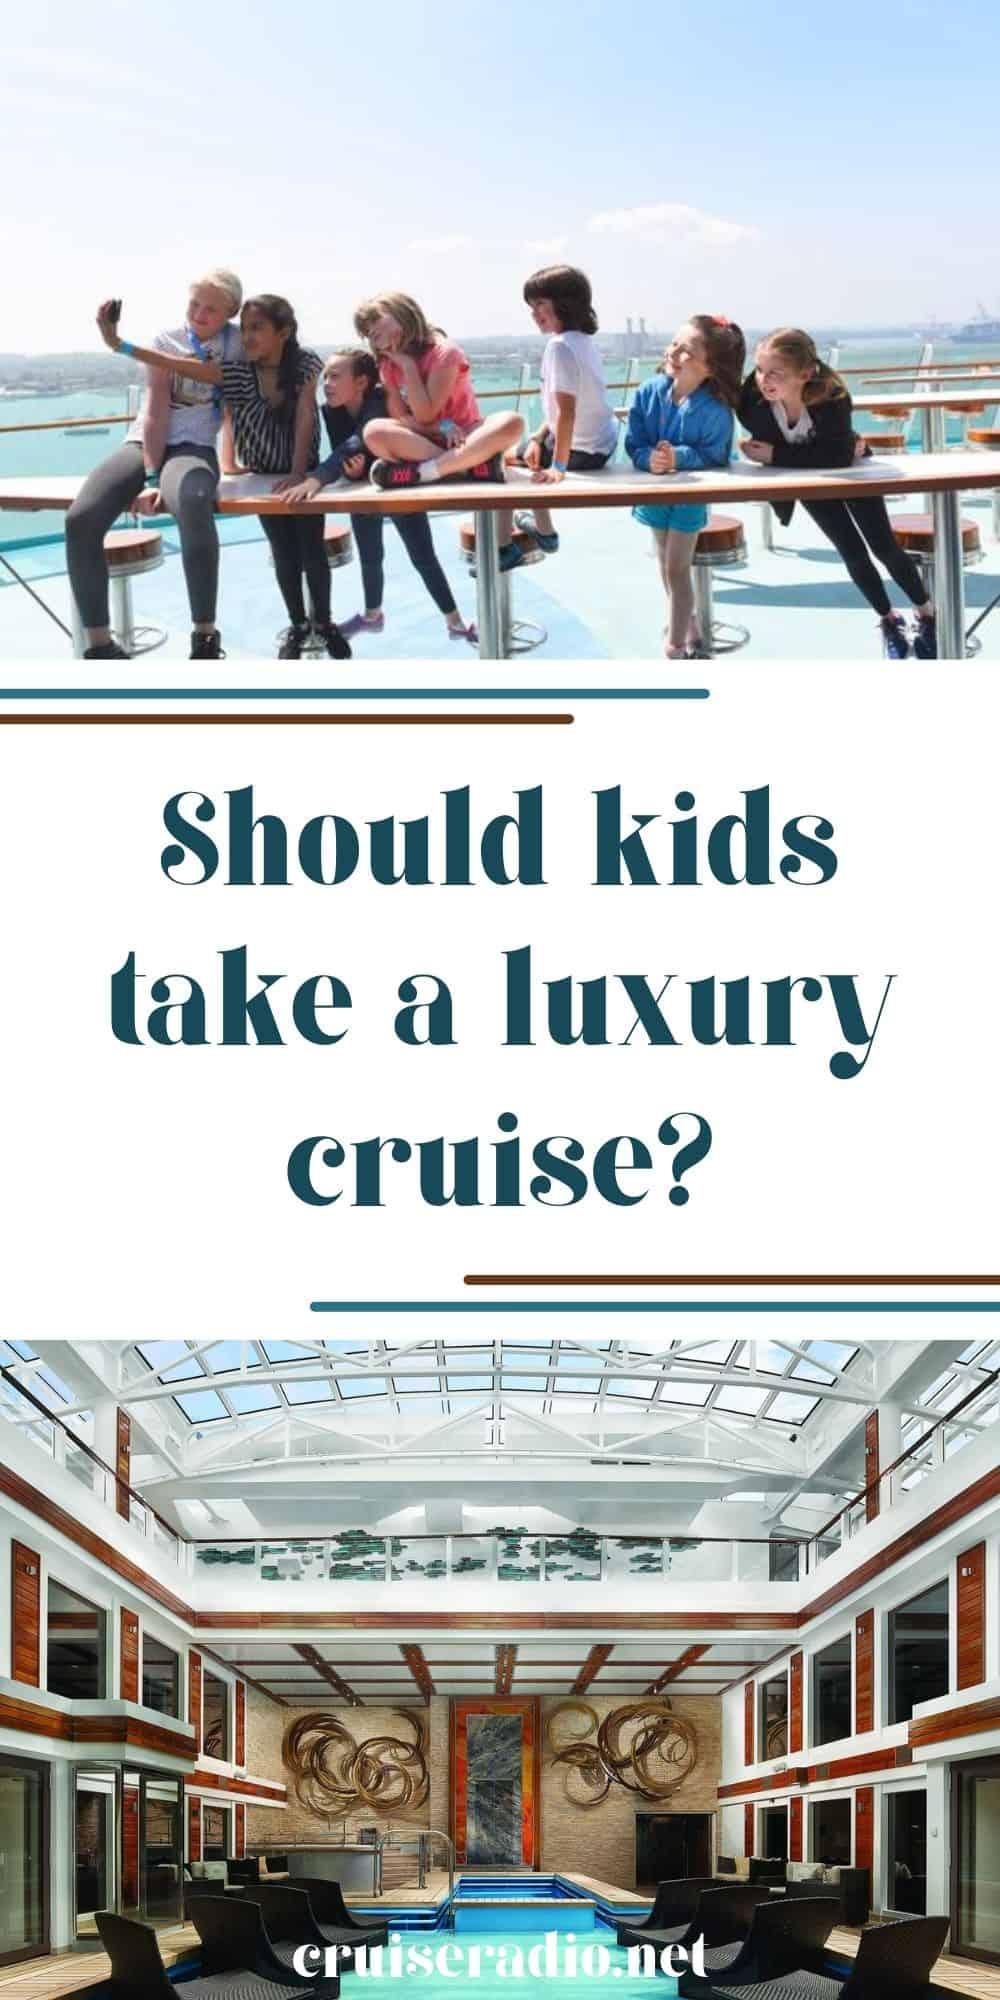 should kids take a luxury cruise?